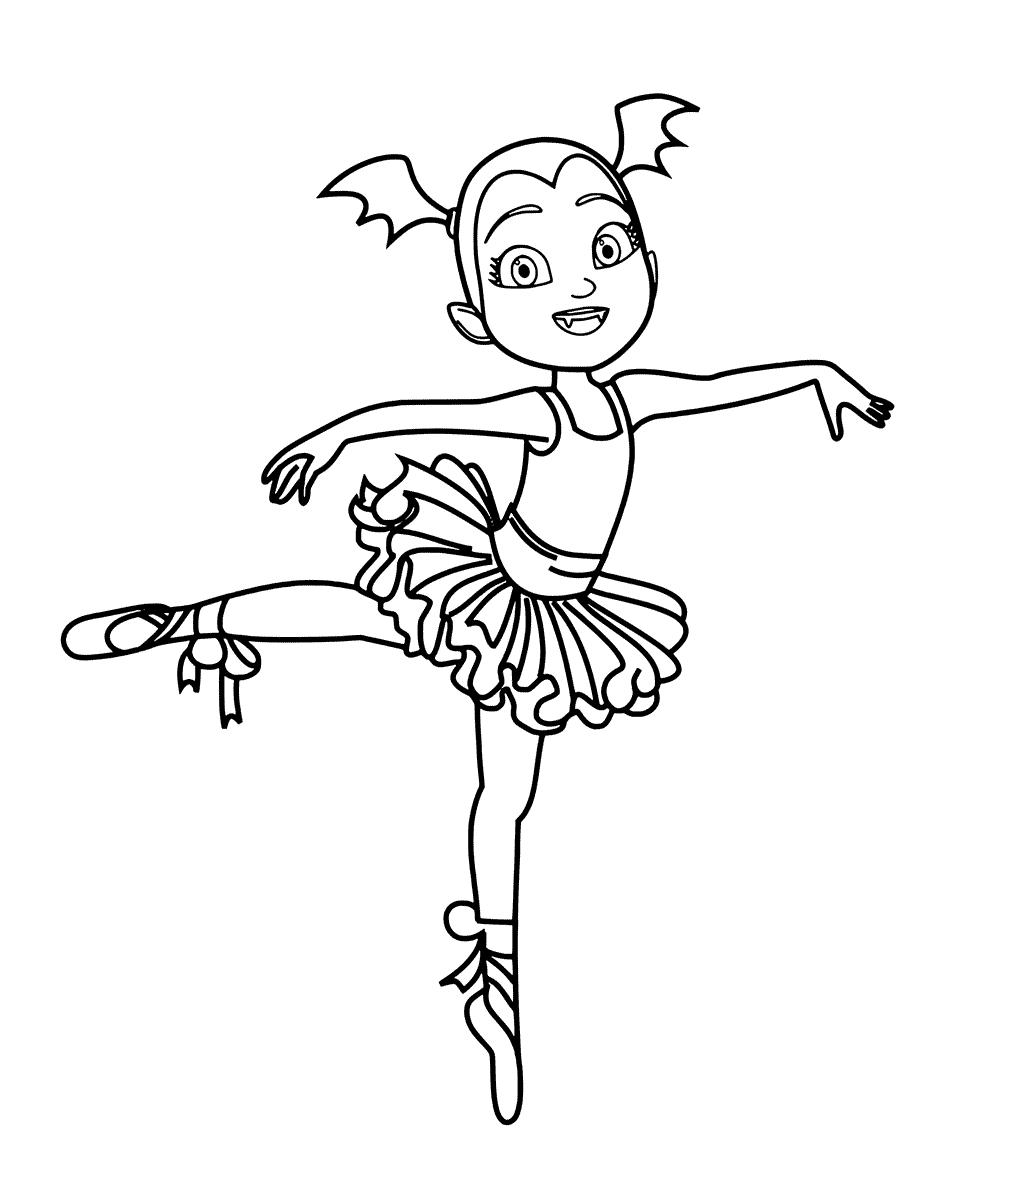 Vampirina Coloring Pages at GetDrawings Free for